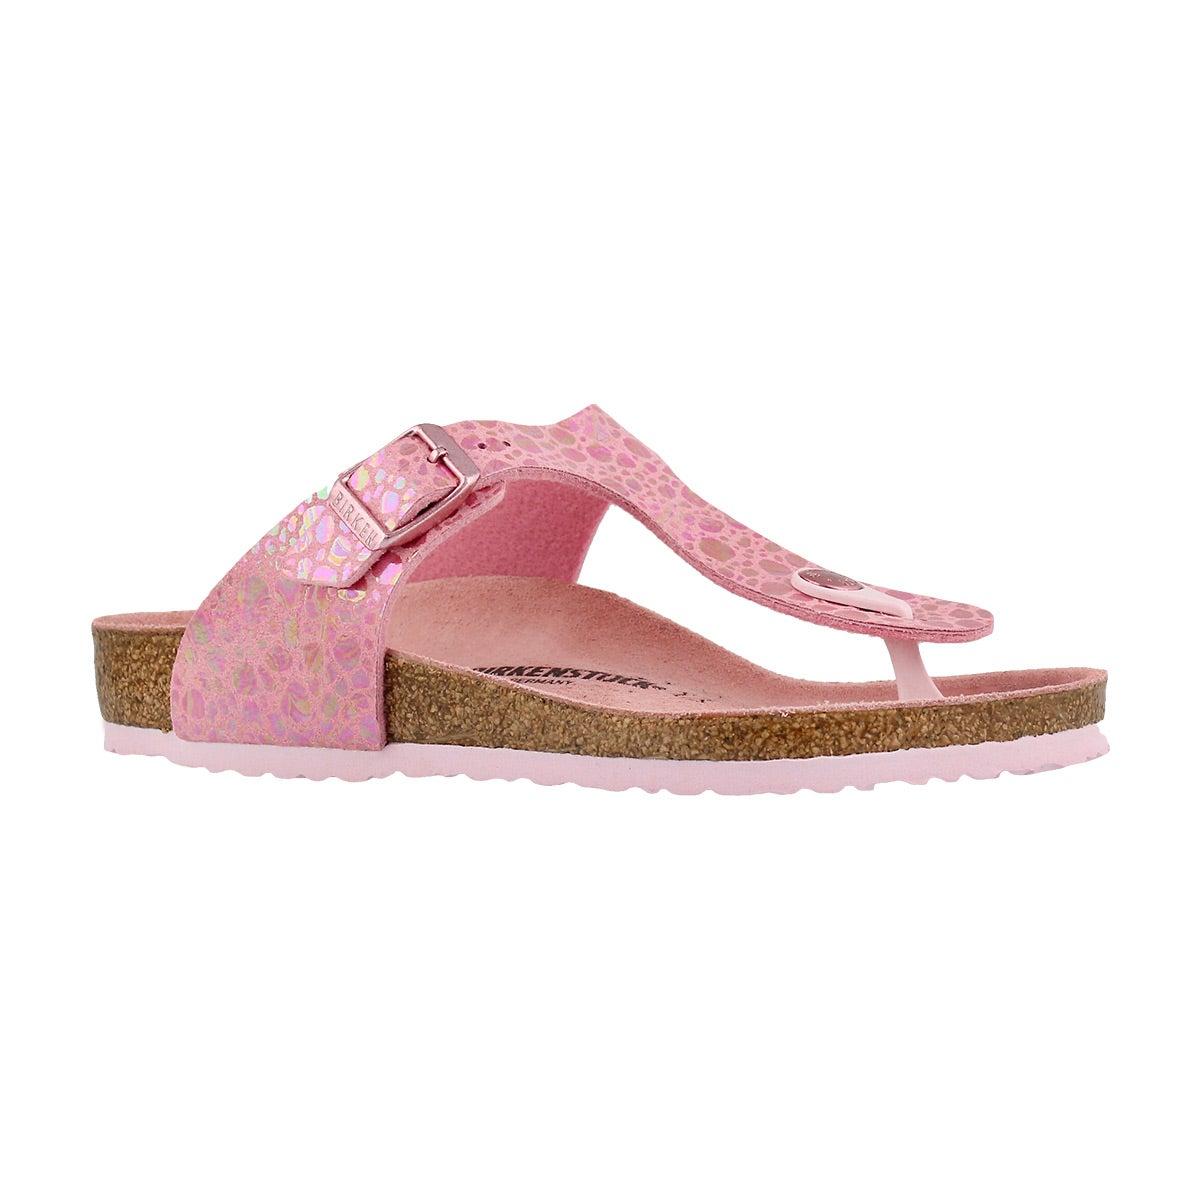 Girls' GIZEH BF metallic pink thg sandals - Narrow